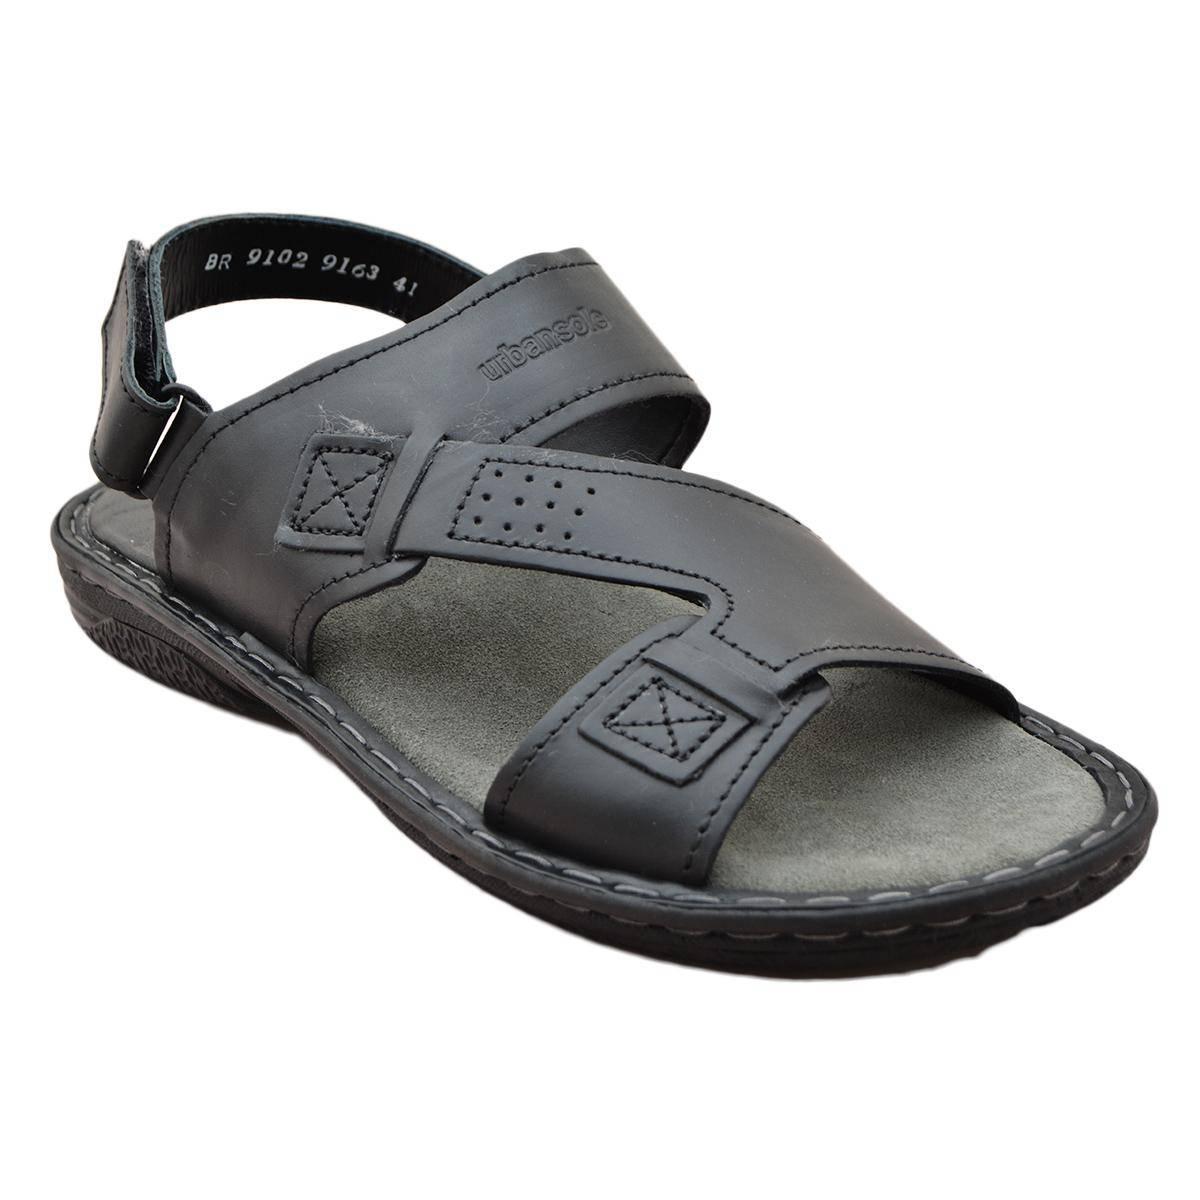 Urban Sole - Black Casual Sandal for Men - BR-9102